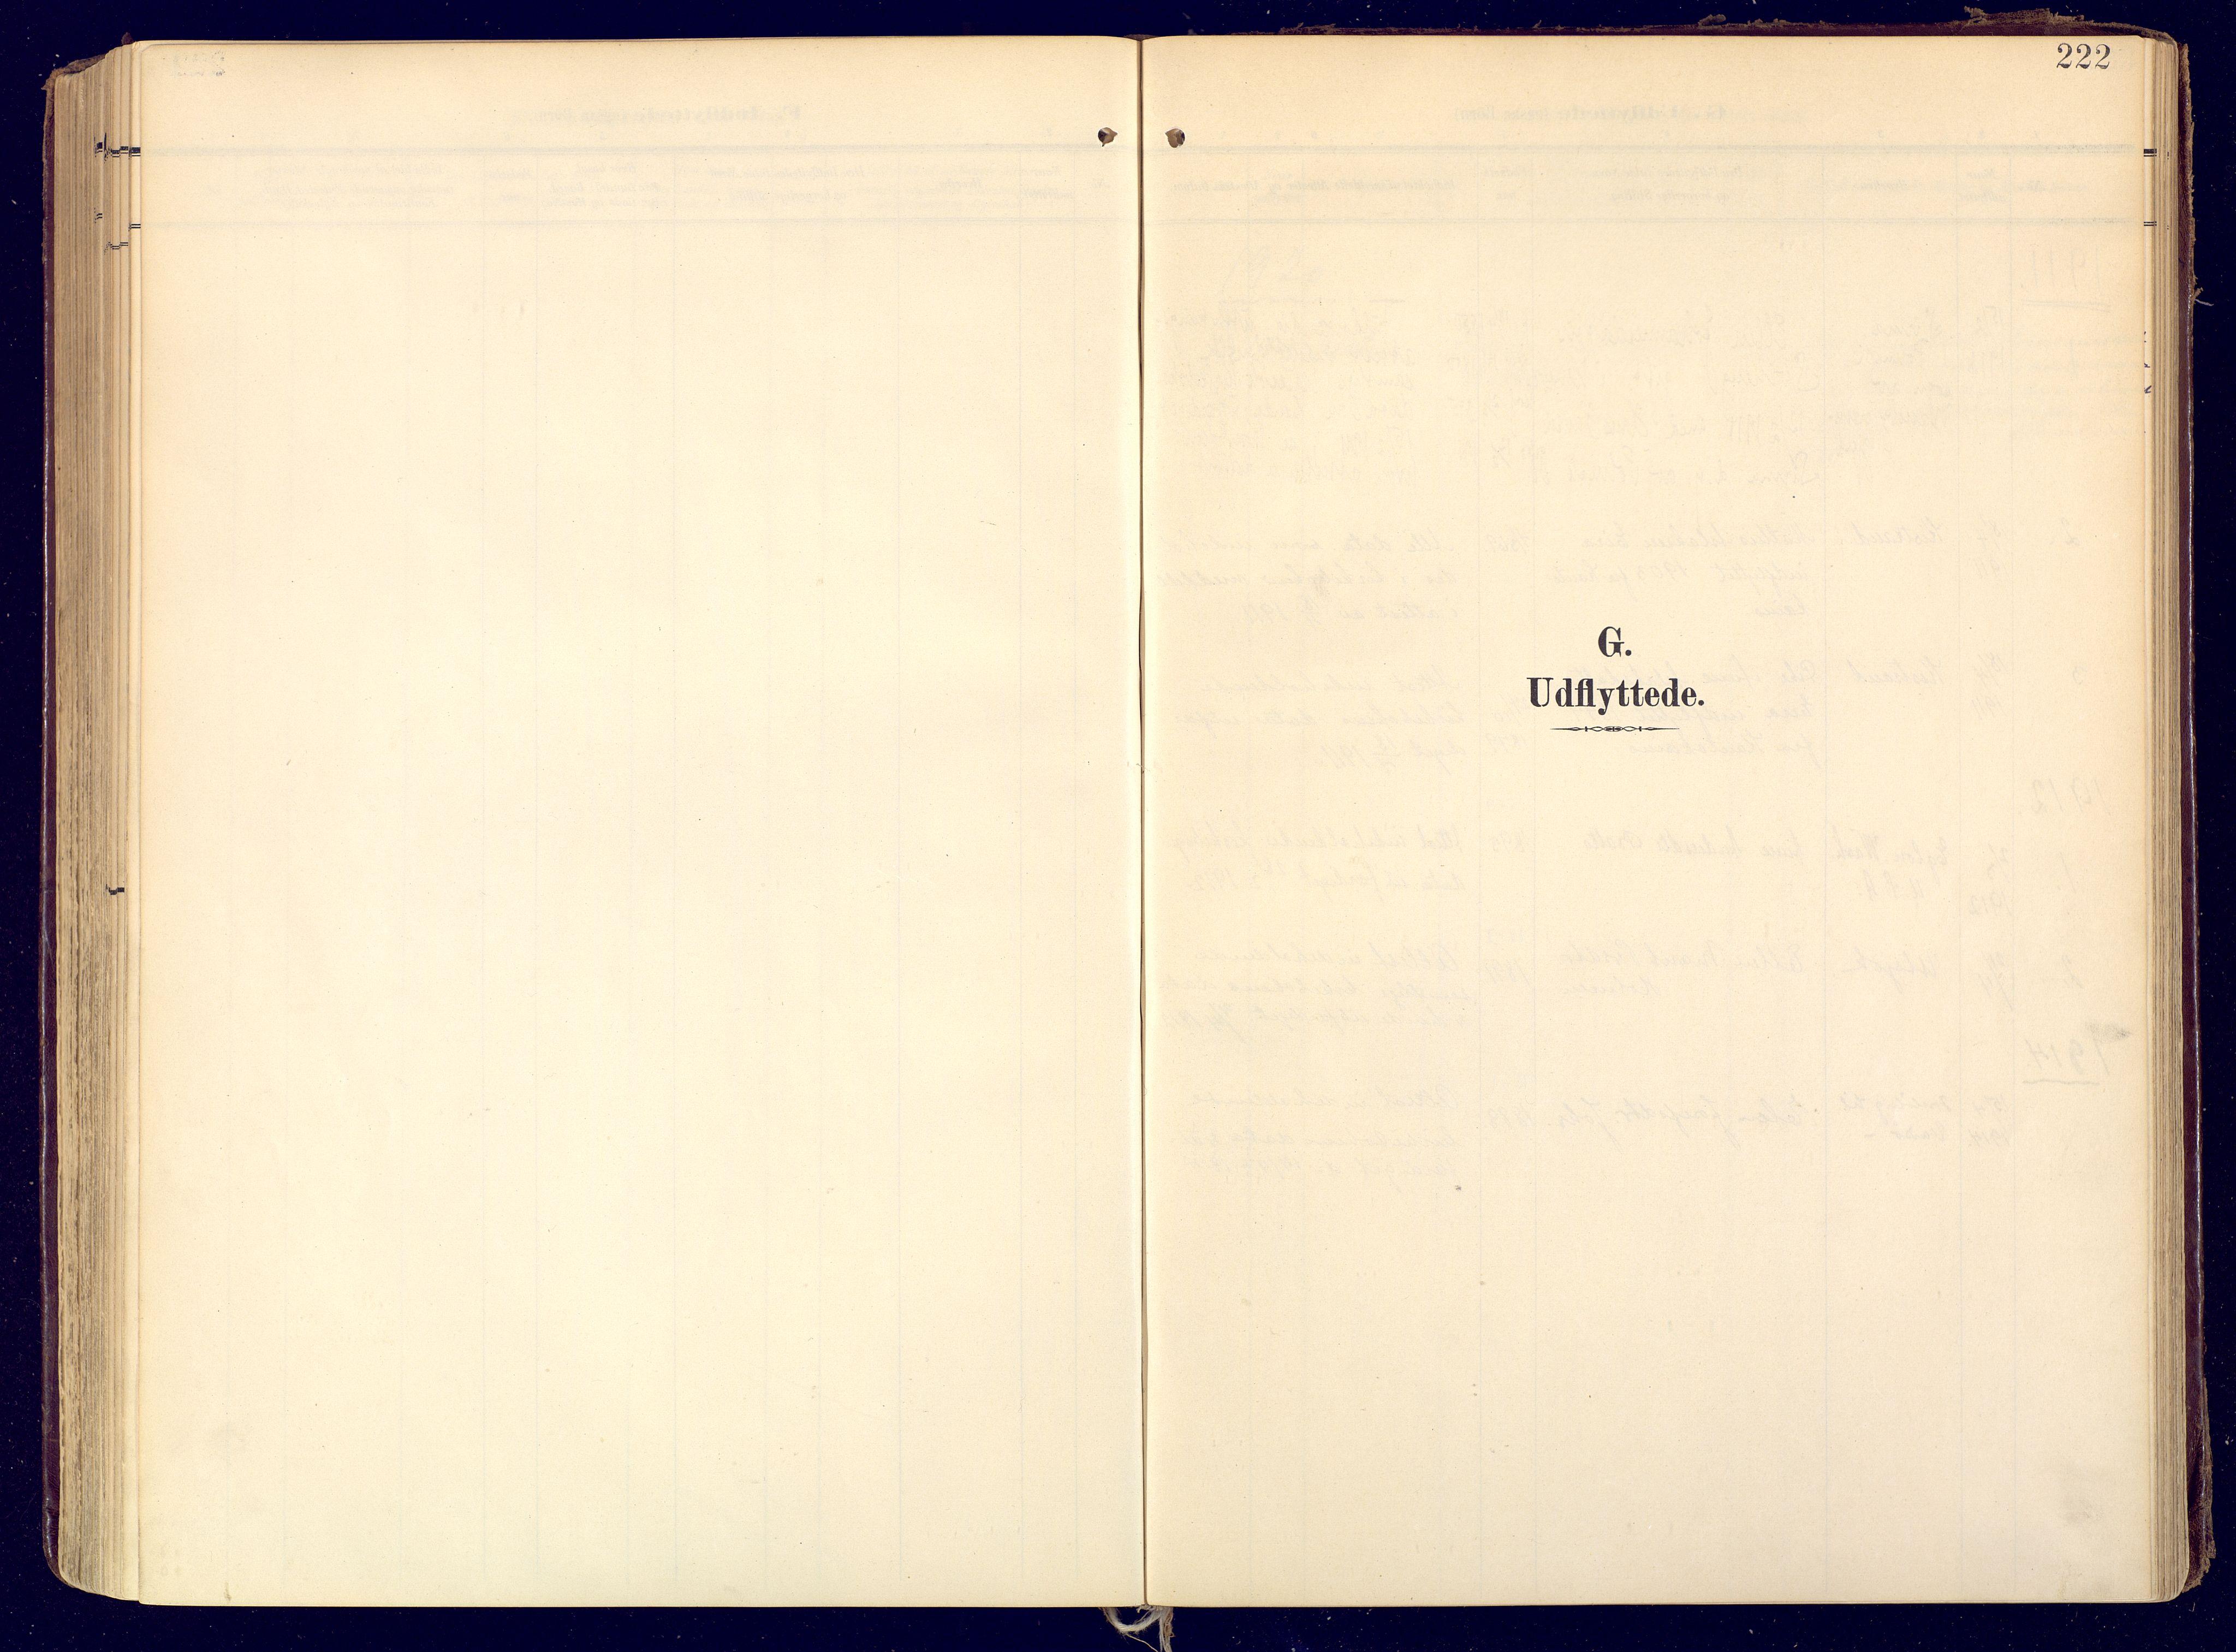 SATØ, Karasjok sokneprestkontor, H/Ha: Ministerialbok nr. 3, 1907-1926, s. 222